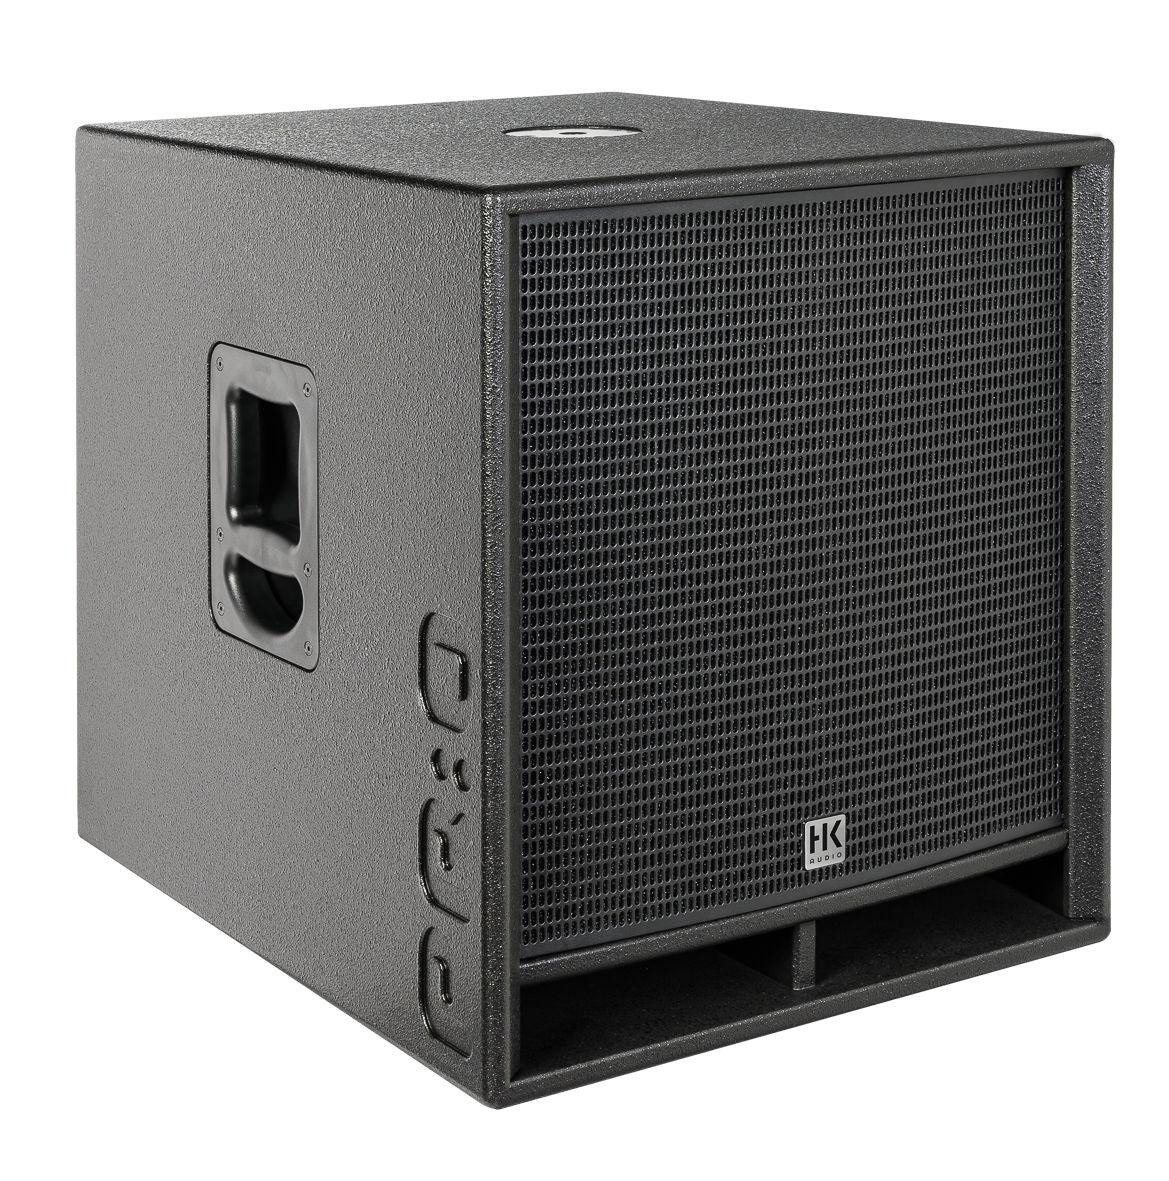 Paboxen - HK Audio PR O 118 SUB D2 - Onlineshop Musikhaus Kirstein